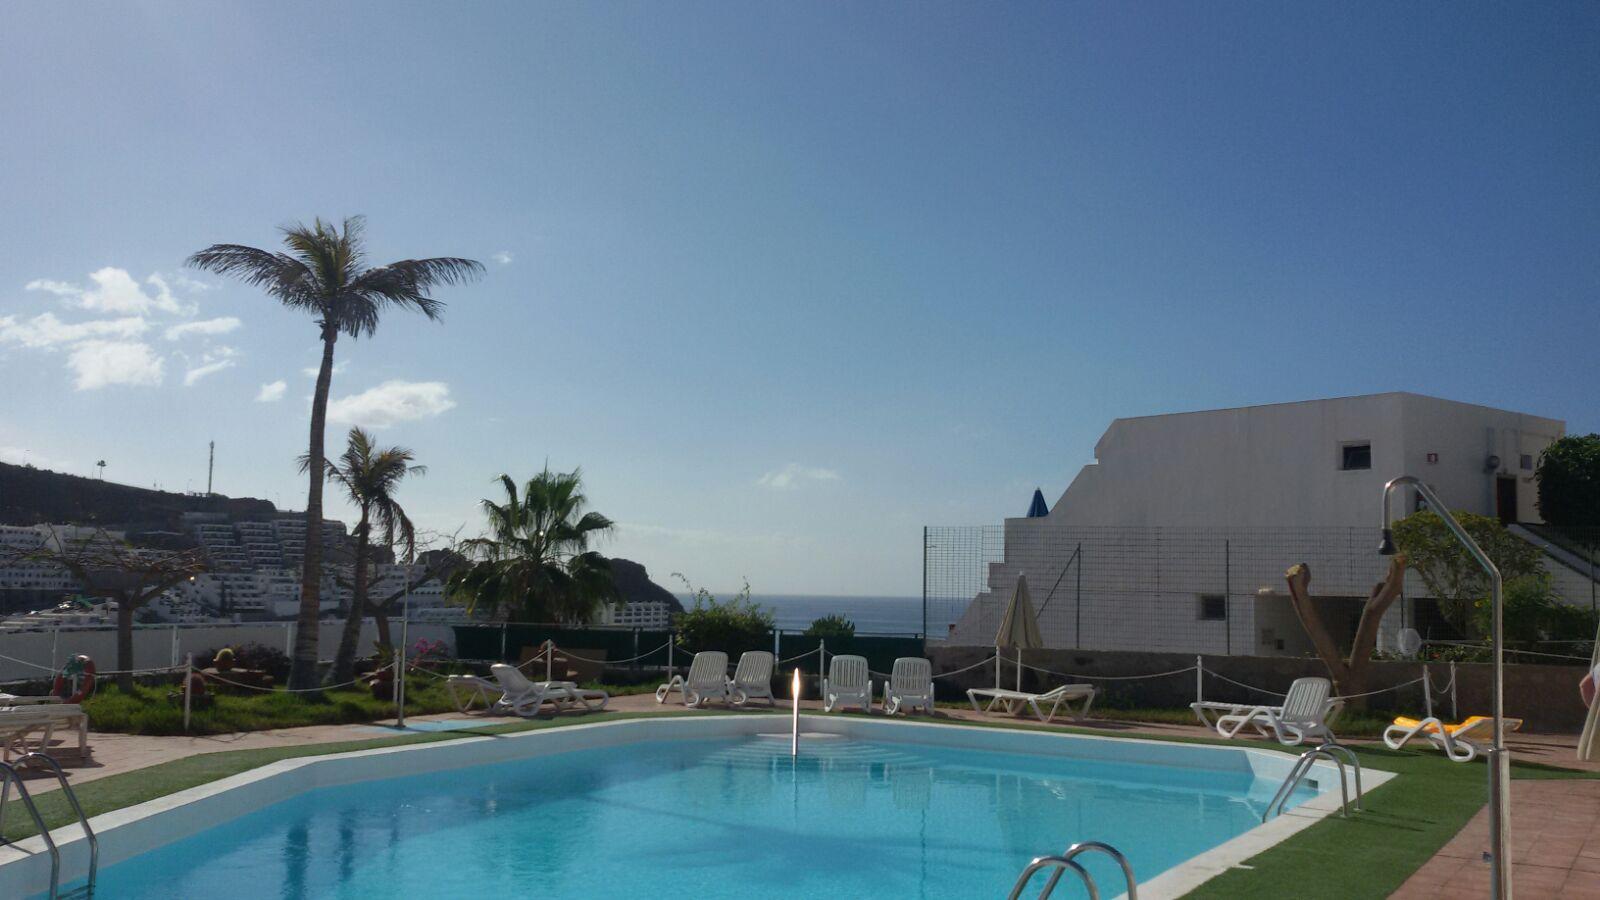 1 Bedroom Apartment in Arimar – Puerto Rico